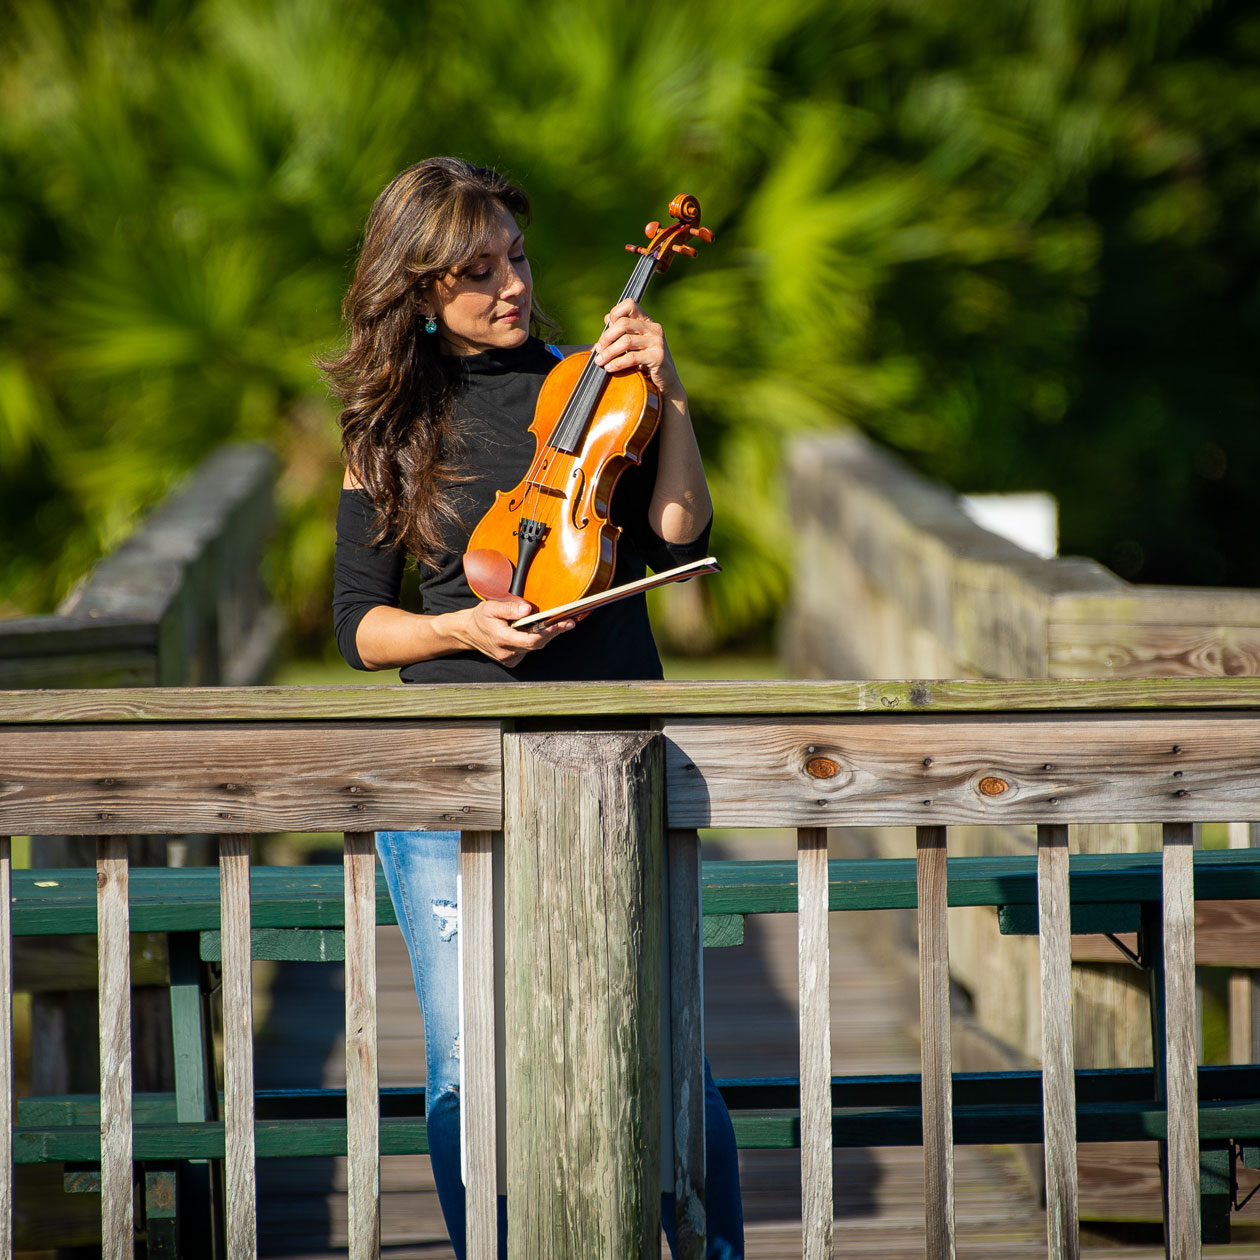 Mariana Lake Violinist #3